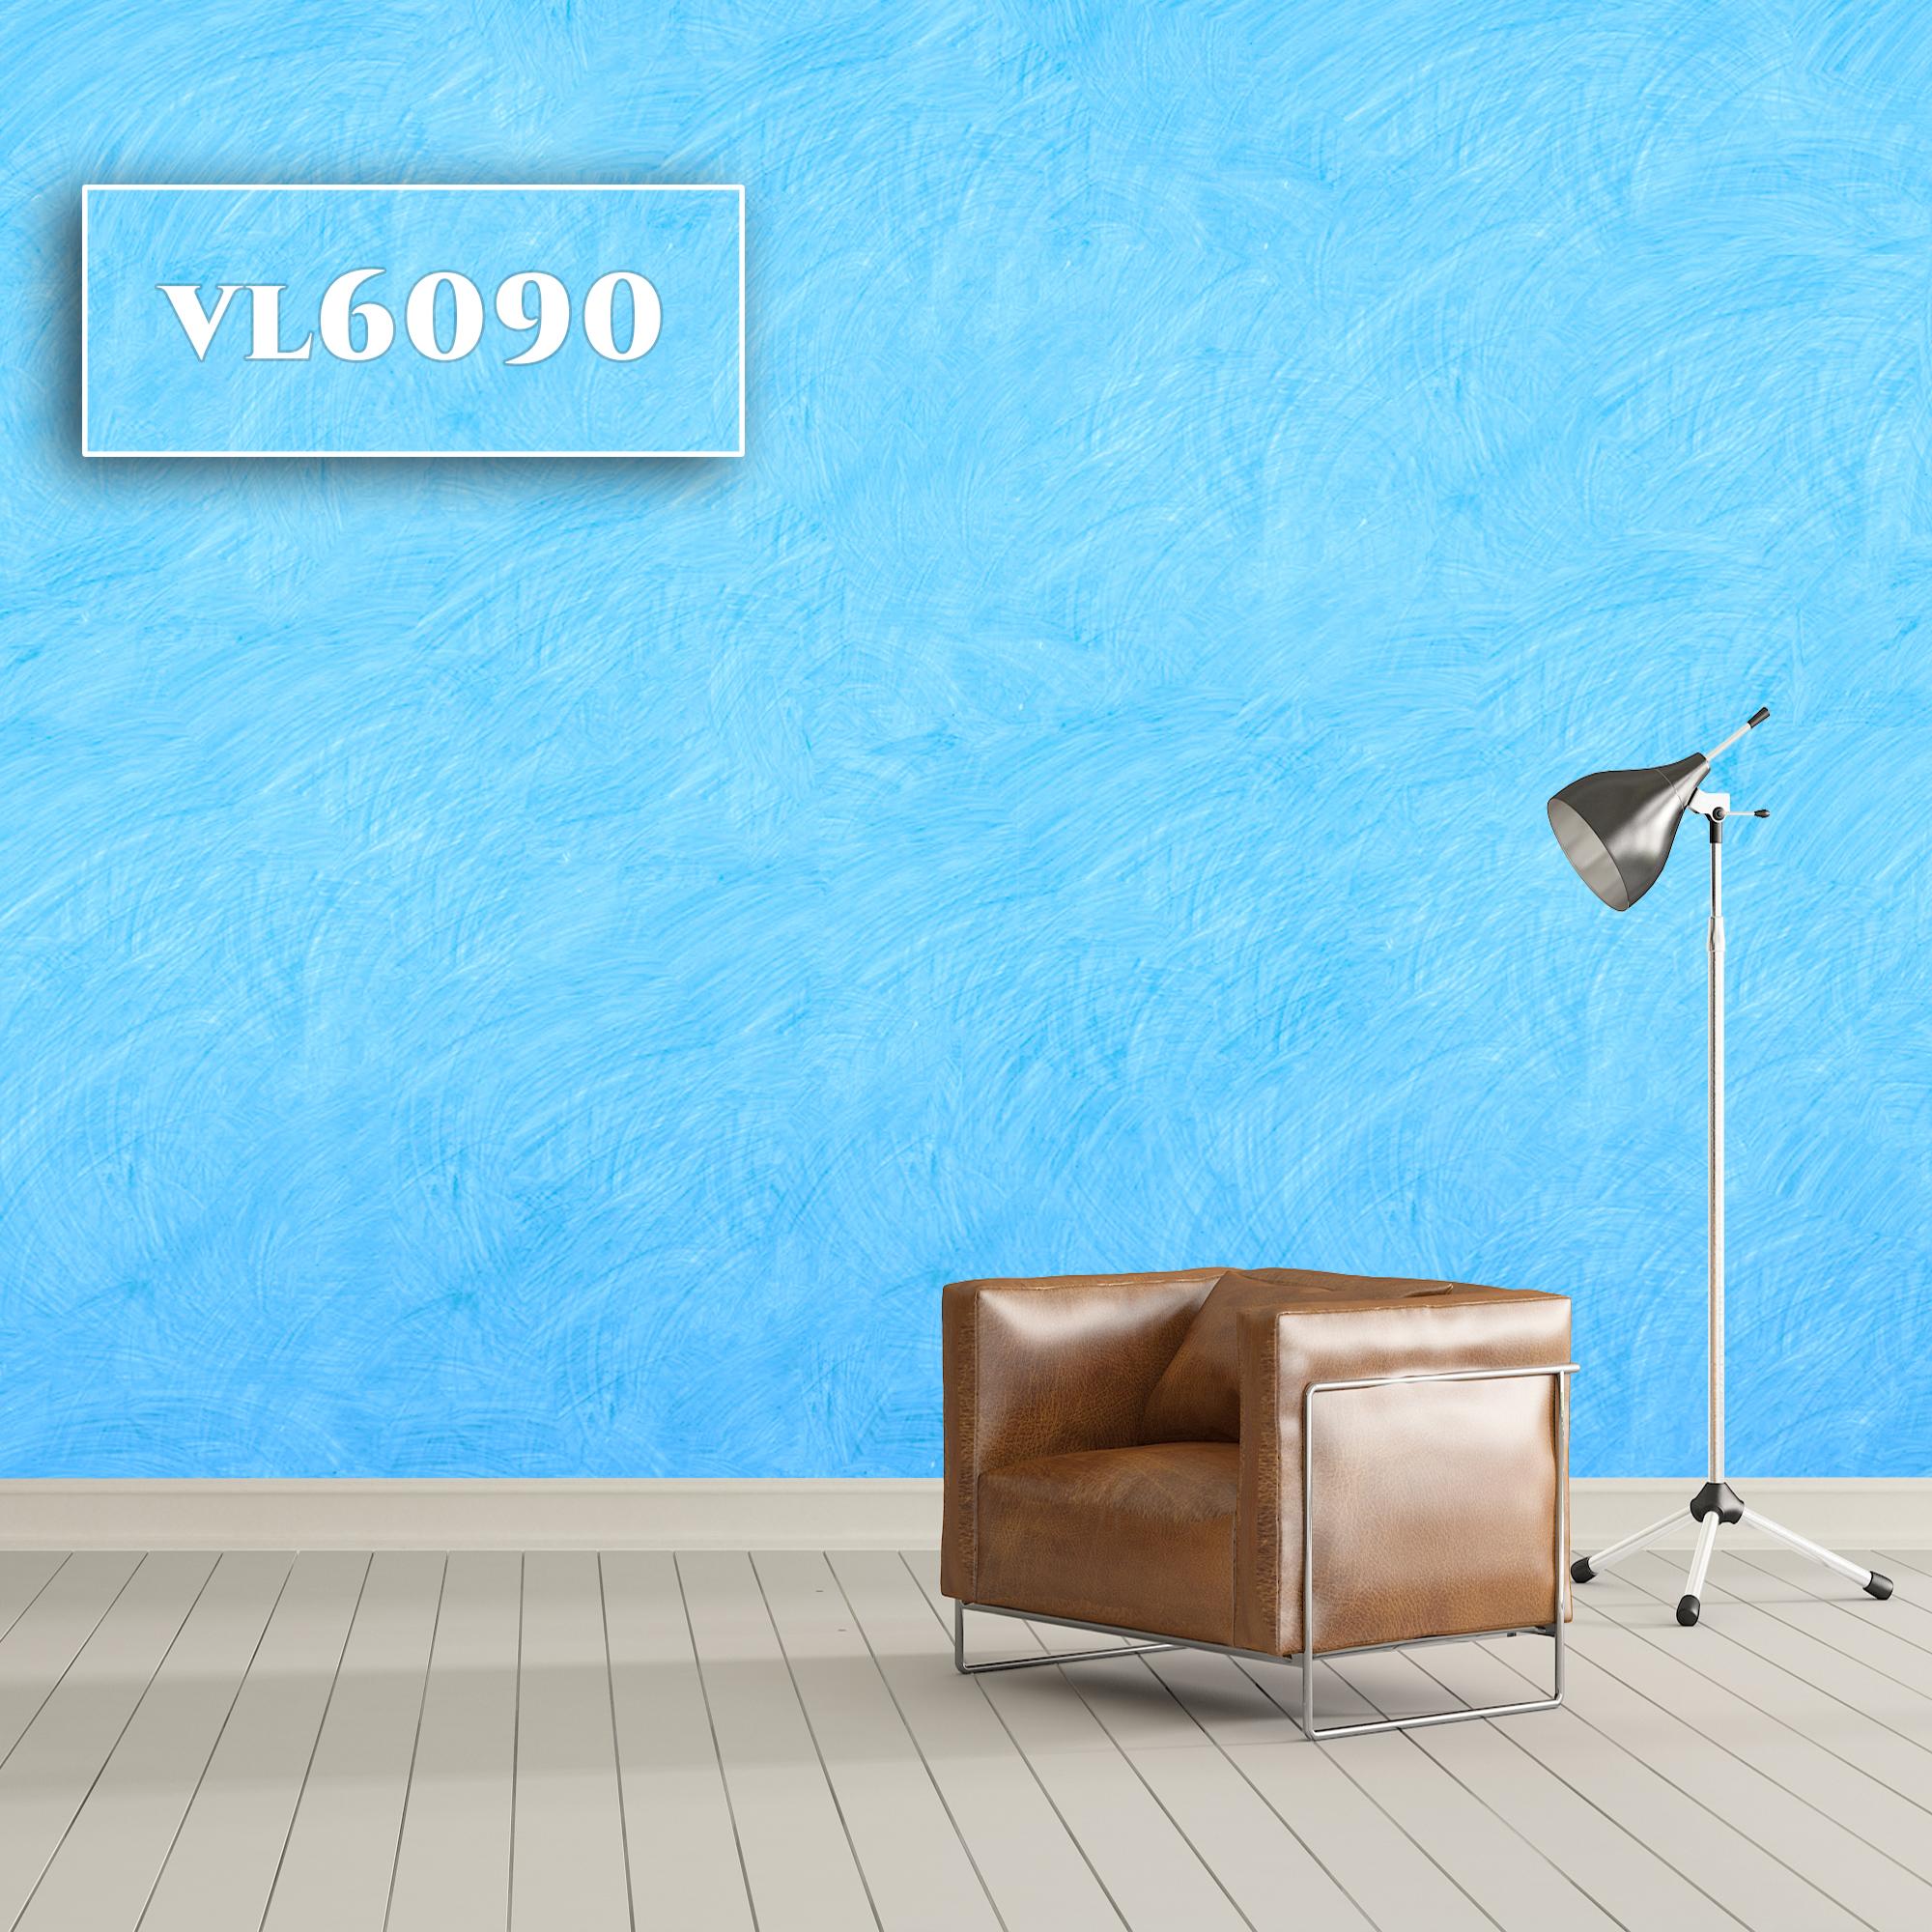 VL6090